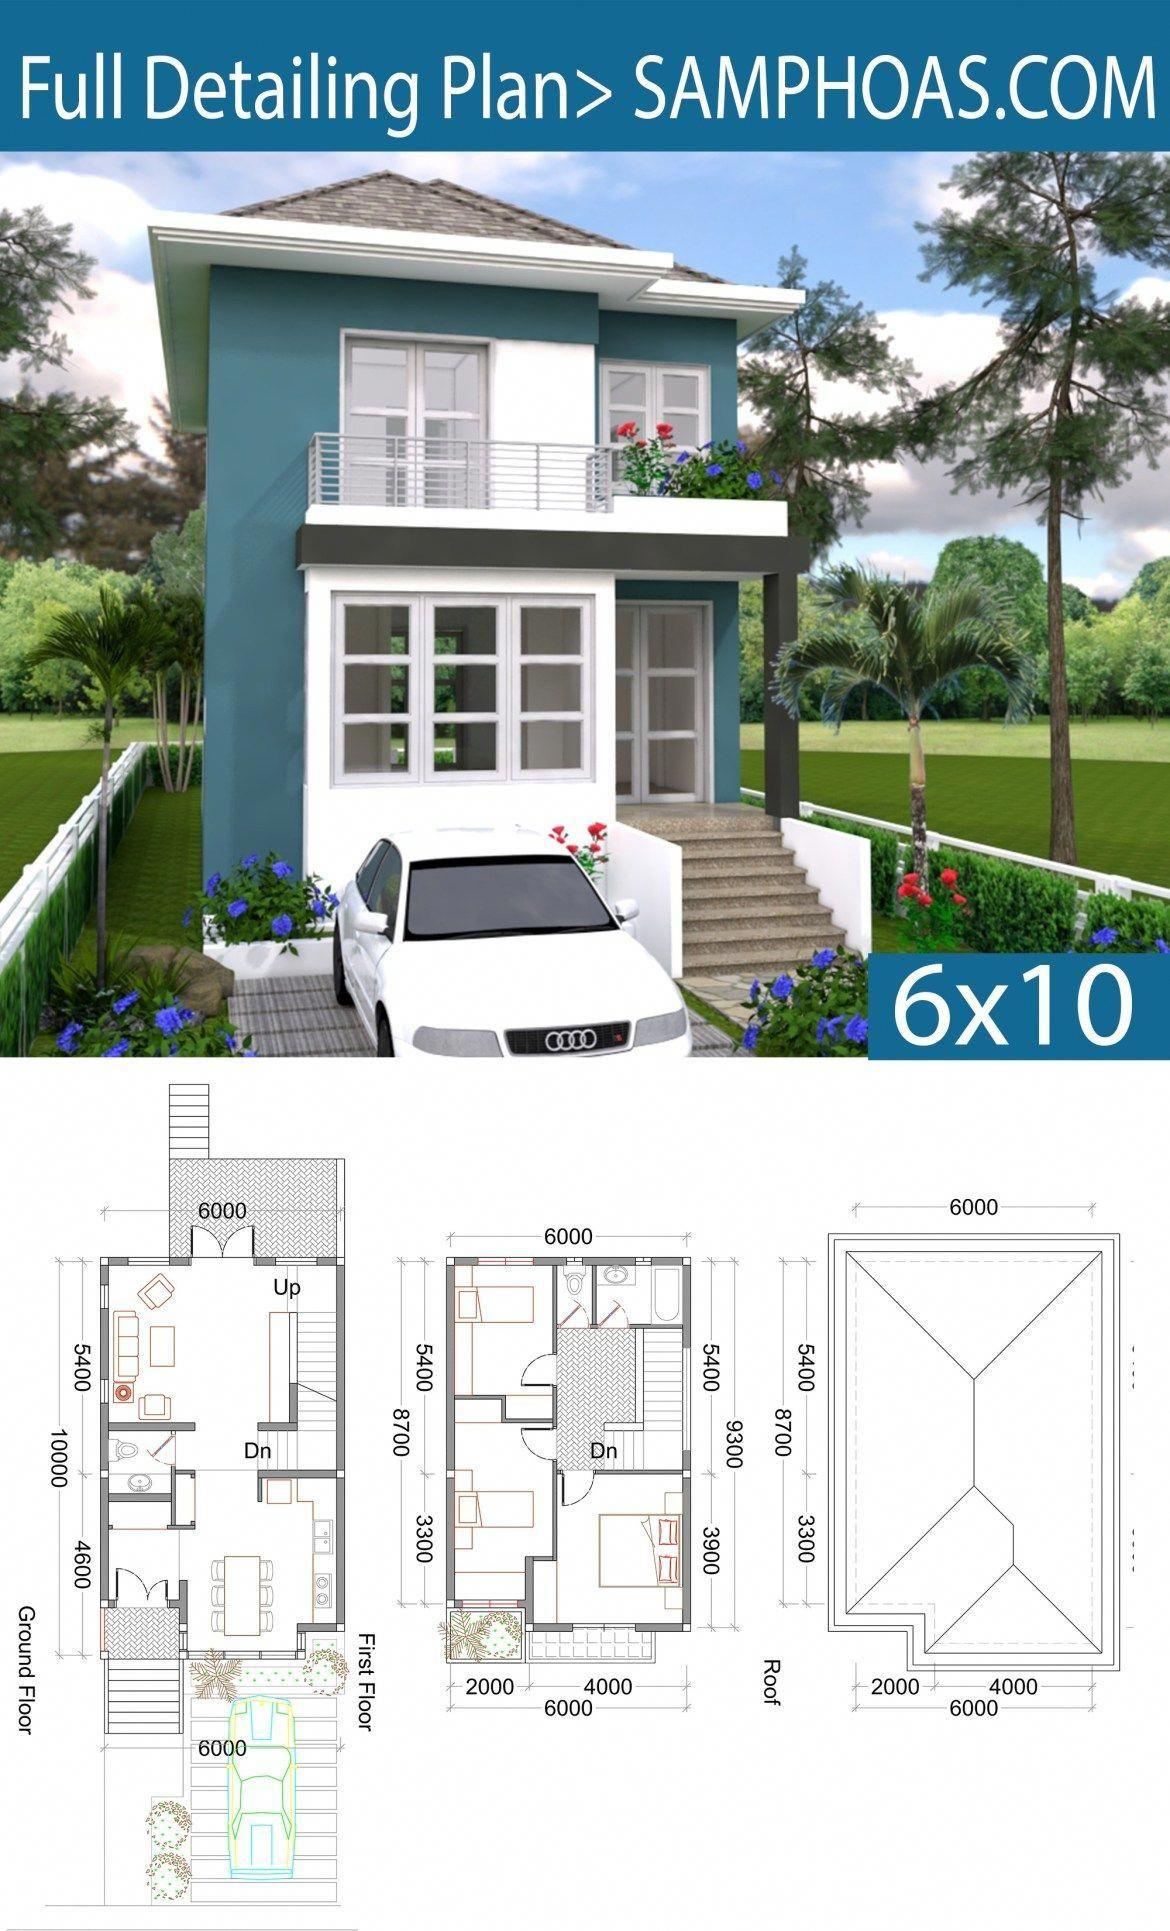 Modern Home Design Blueprints Modernhomedesign Small House Design Home Design Plan House Design